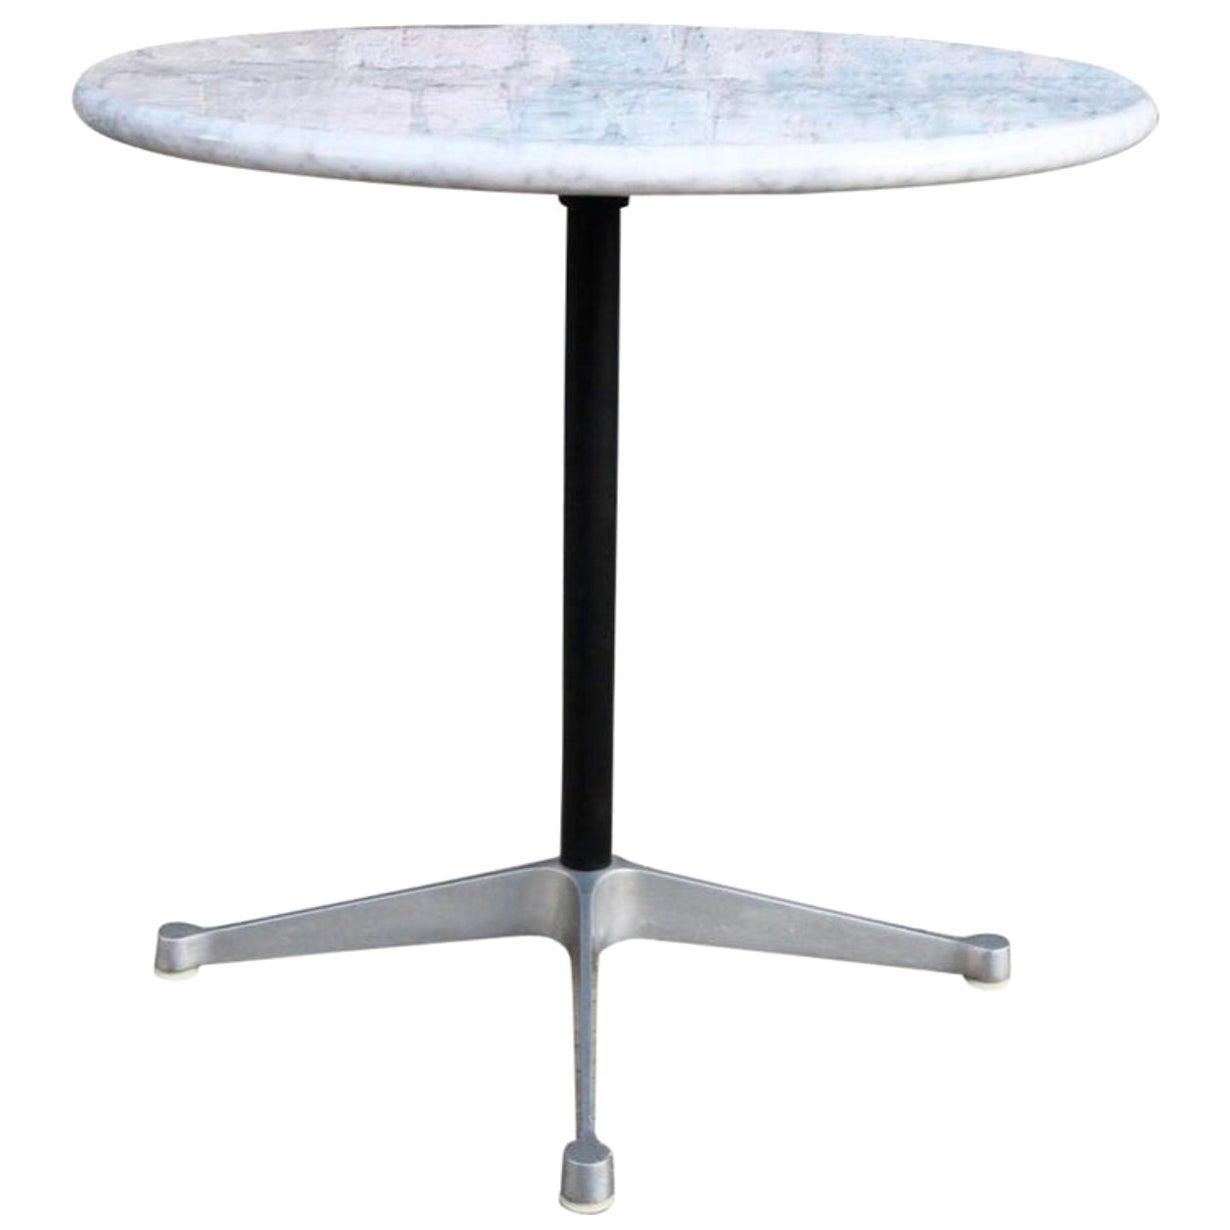 Herman Miller Eames Aluminum Dining Table Base with Custom Carrara Marble Top